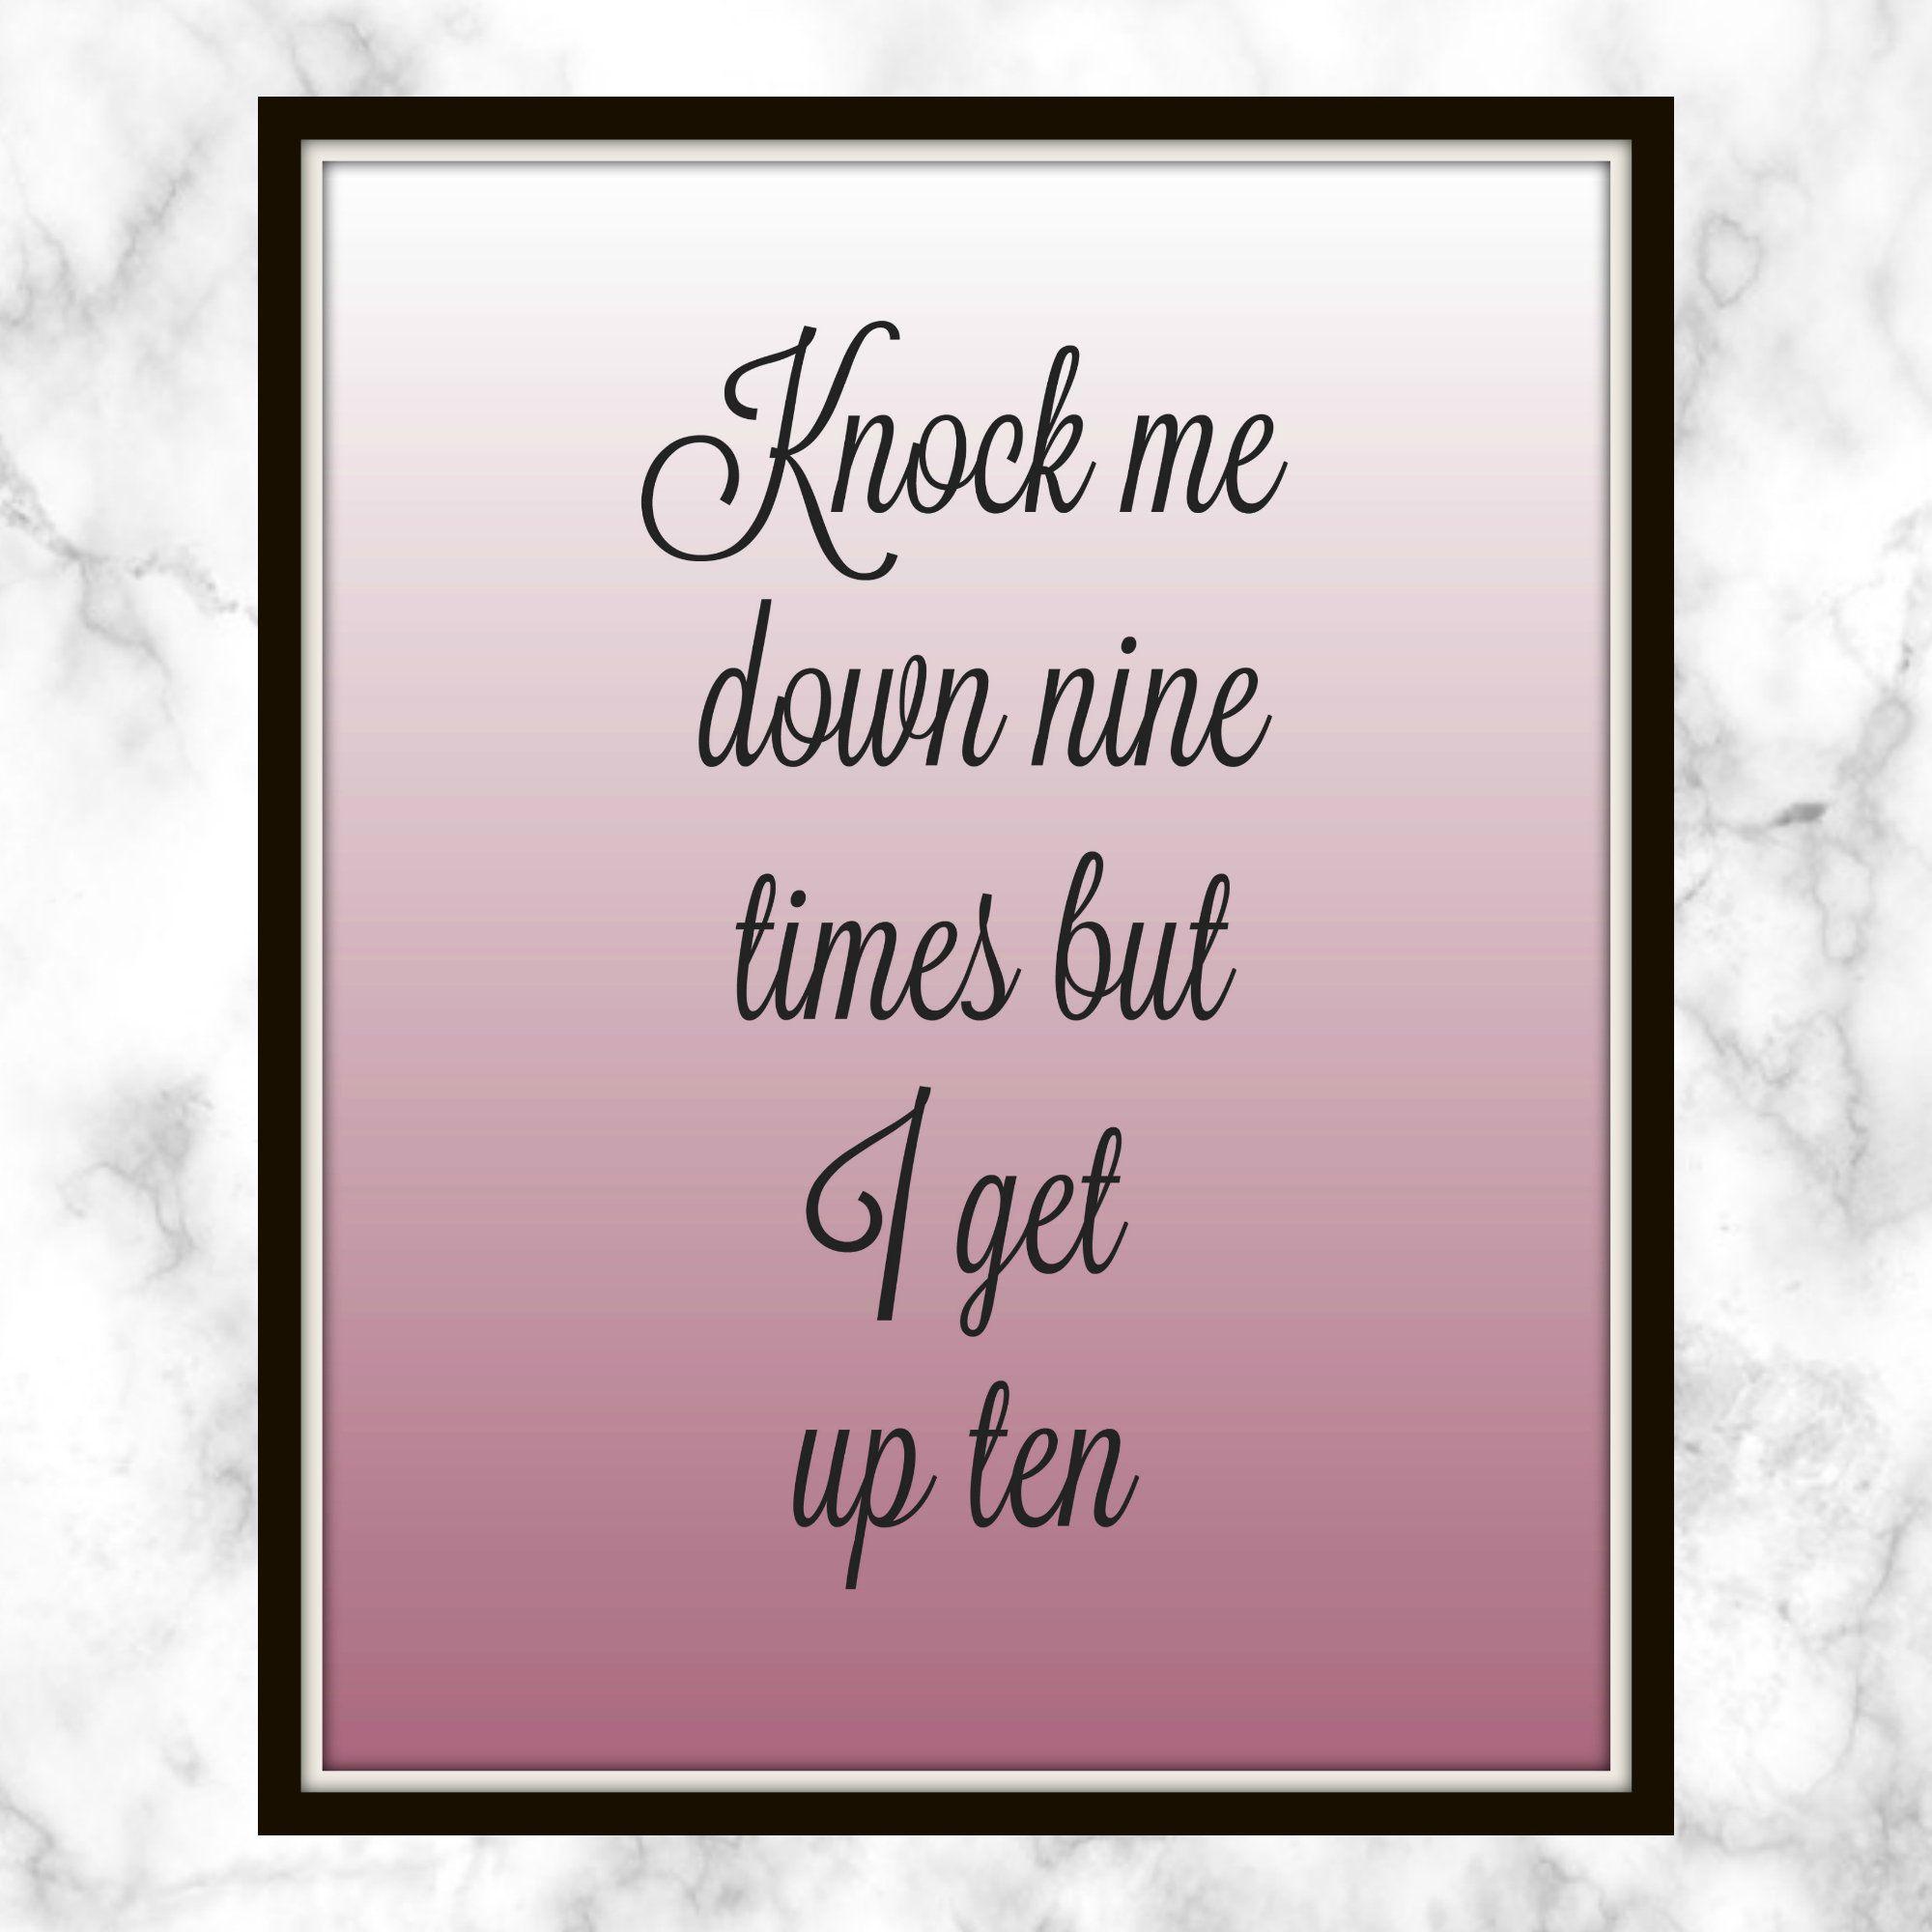 Knock Me Down Nine Times But I Get Up Ten Cardi B Lyrics Printable Get Up 10 Invasion Of Privacy I Get Back U Cardi B Quotes Cardi B Cardi B Lyrics